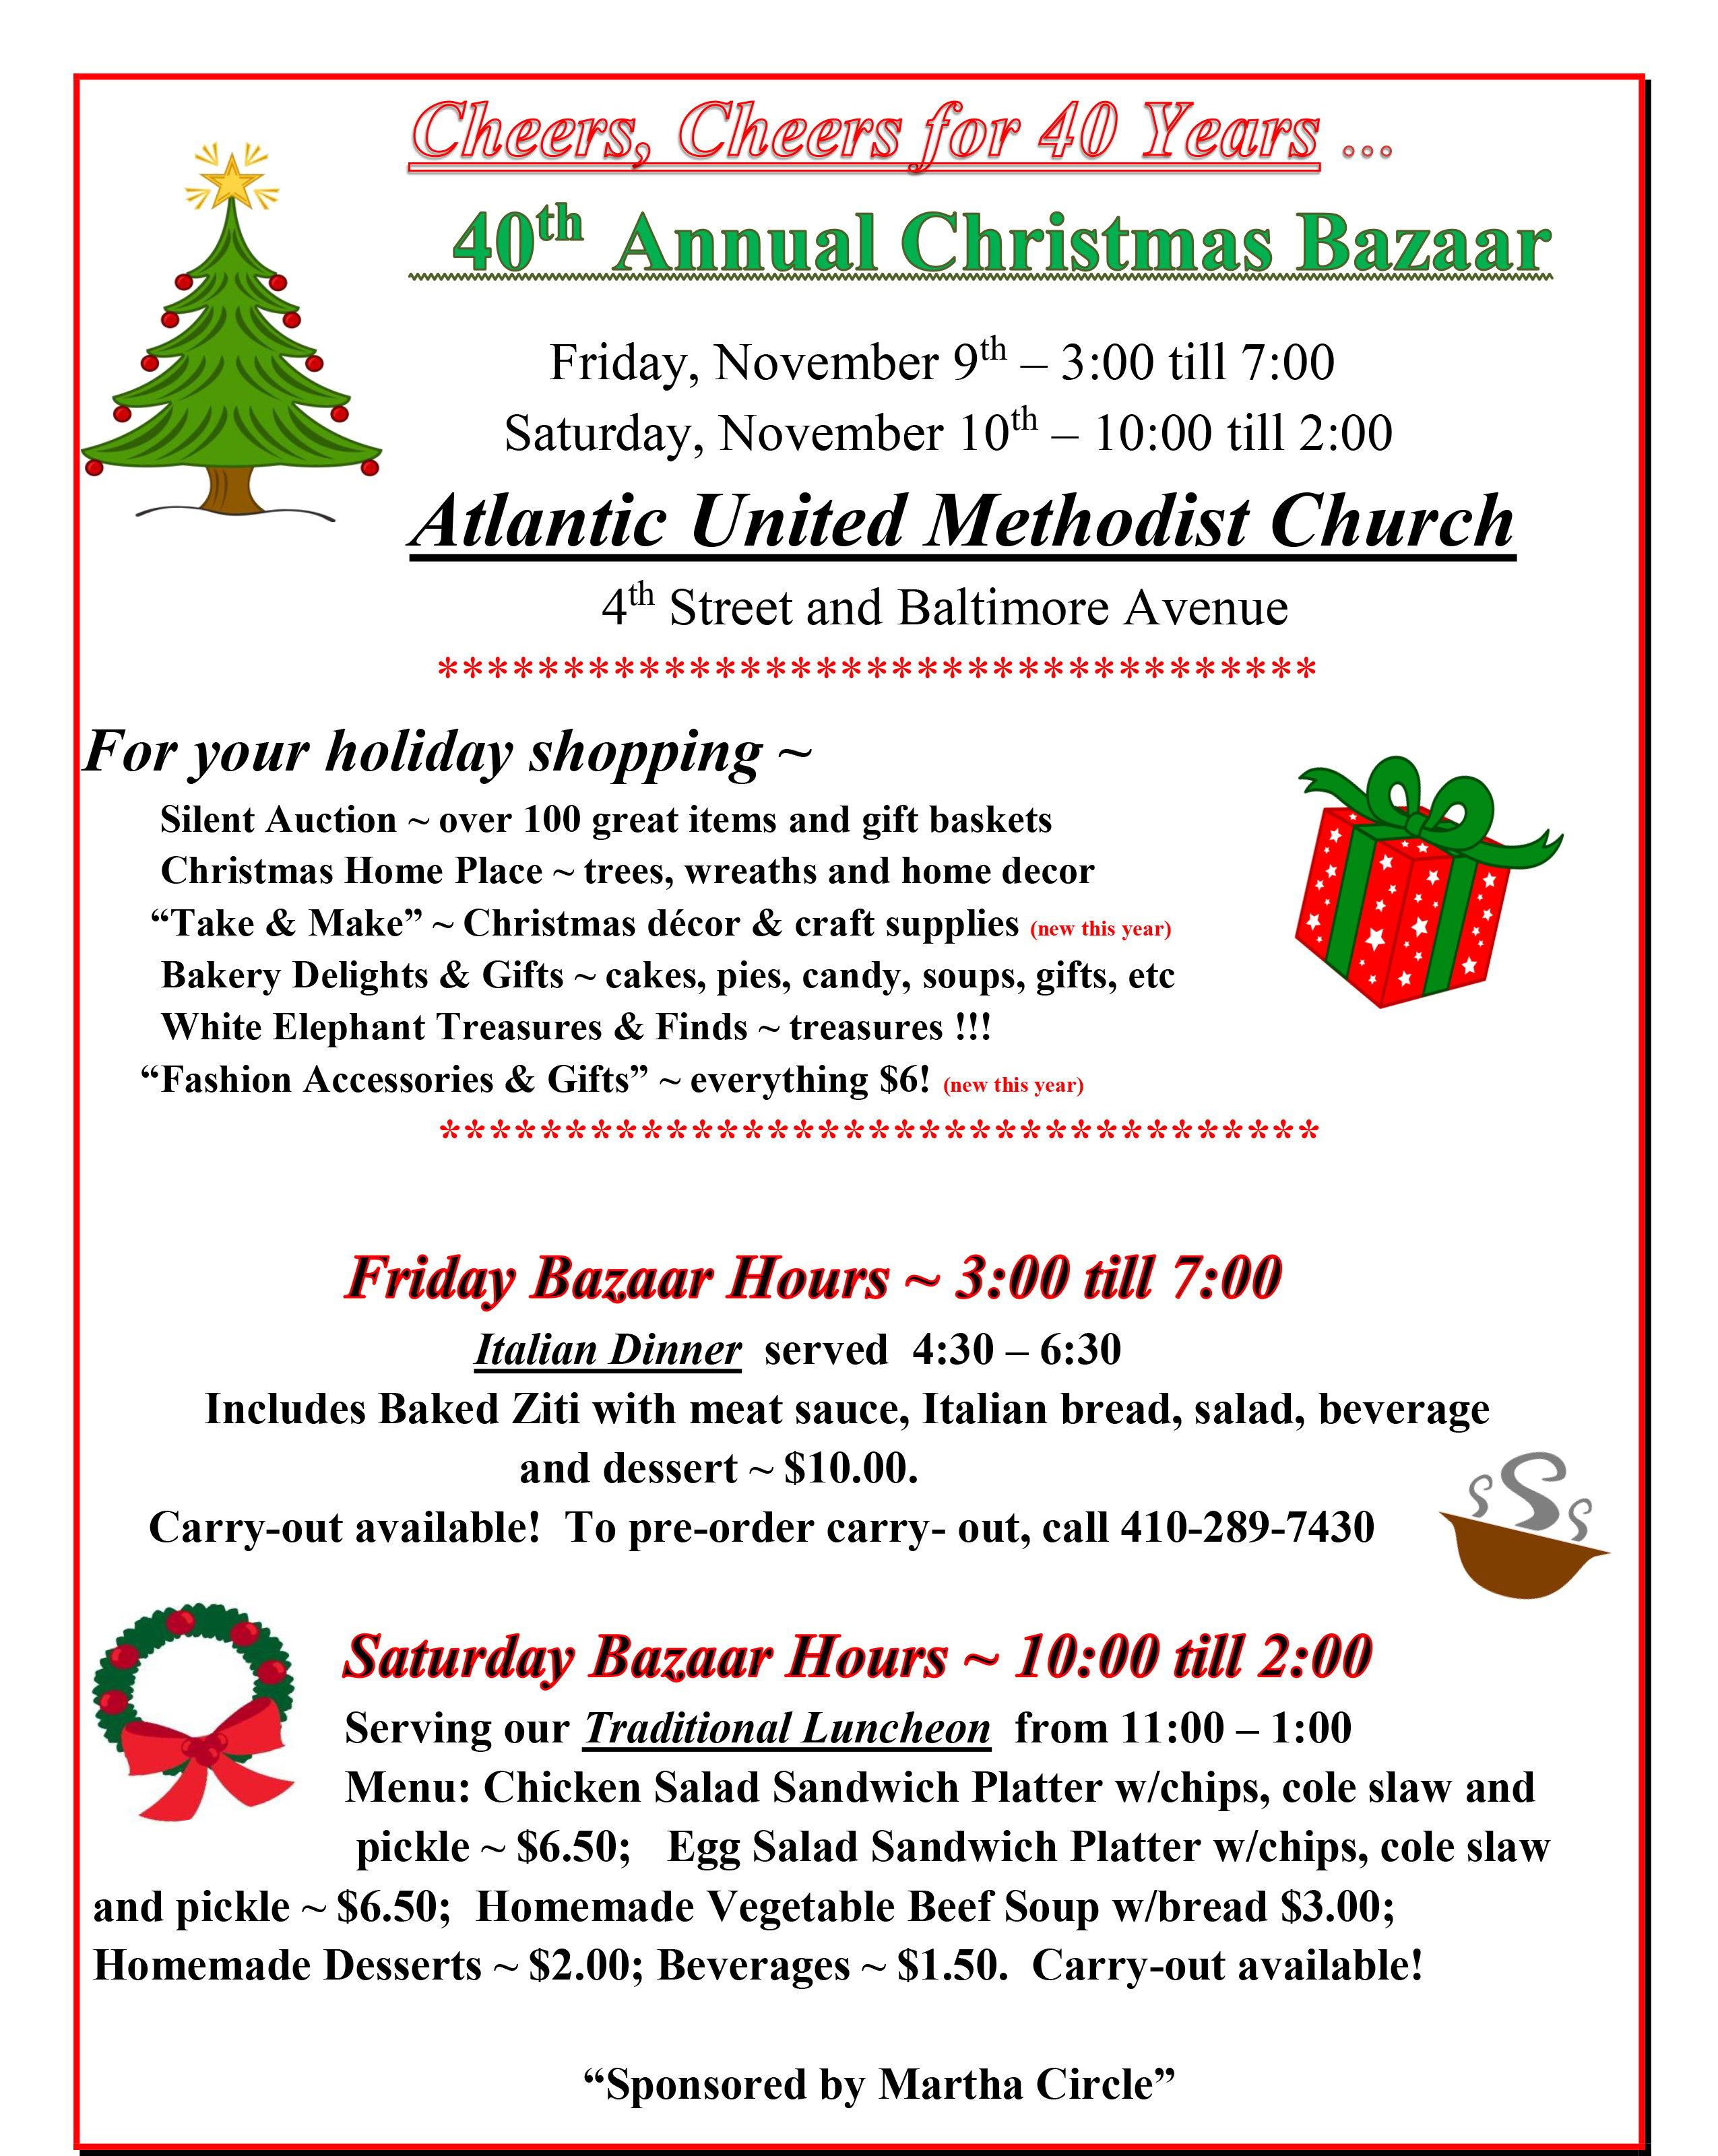 Atlantic United Methodist Church 40th Annual Christmas Bazaar - 47abc